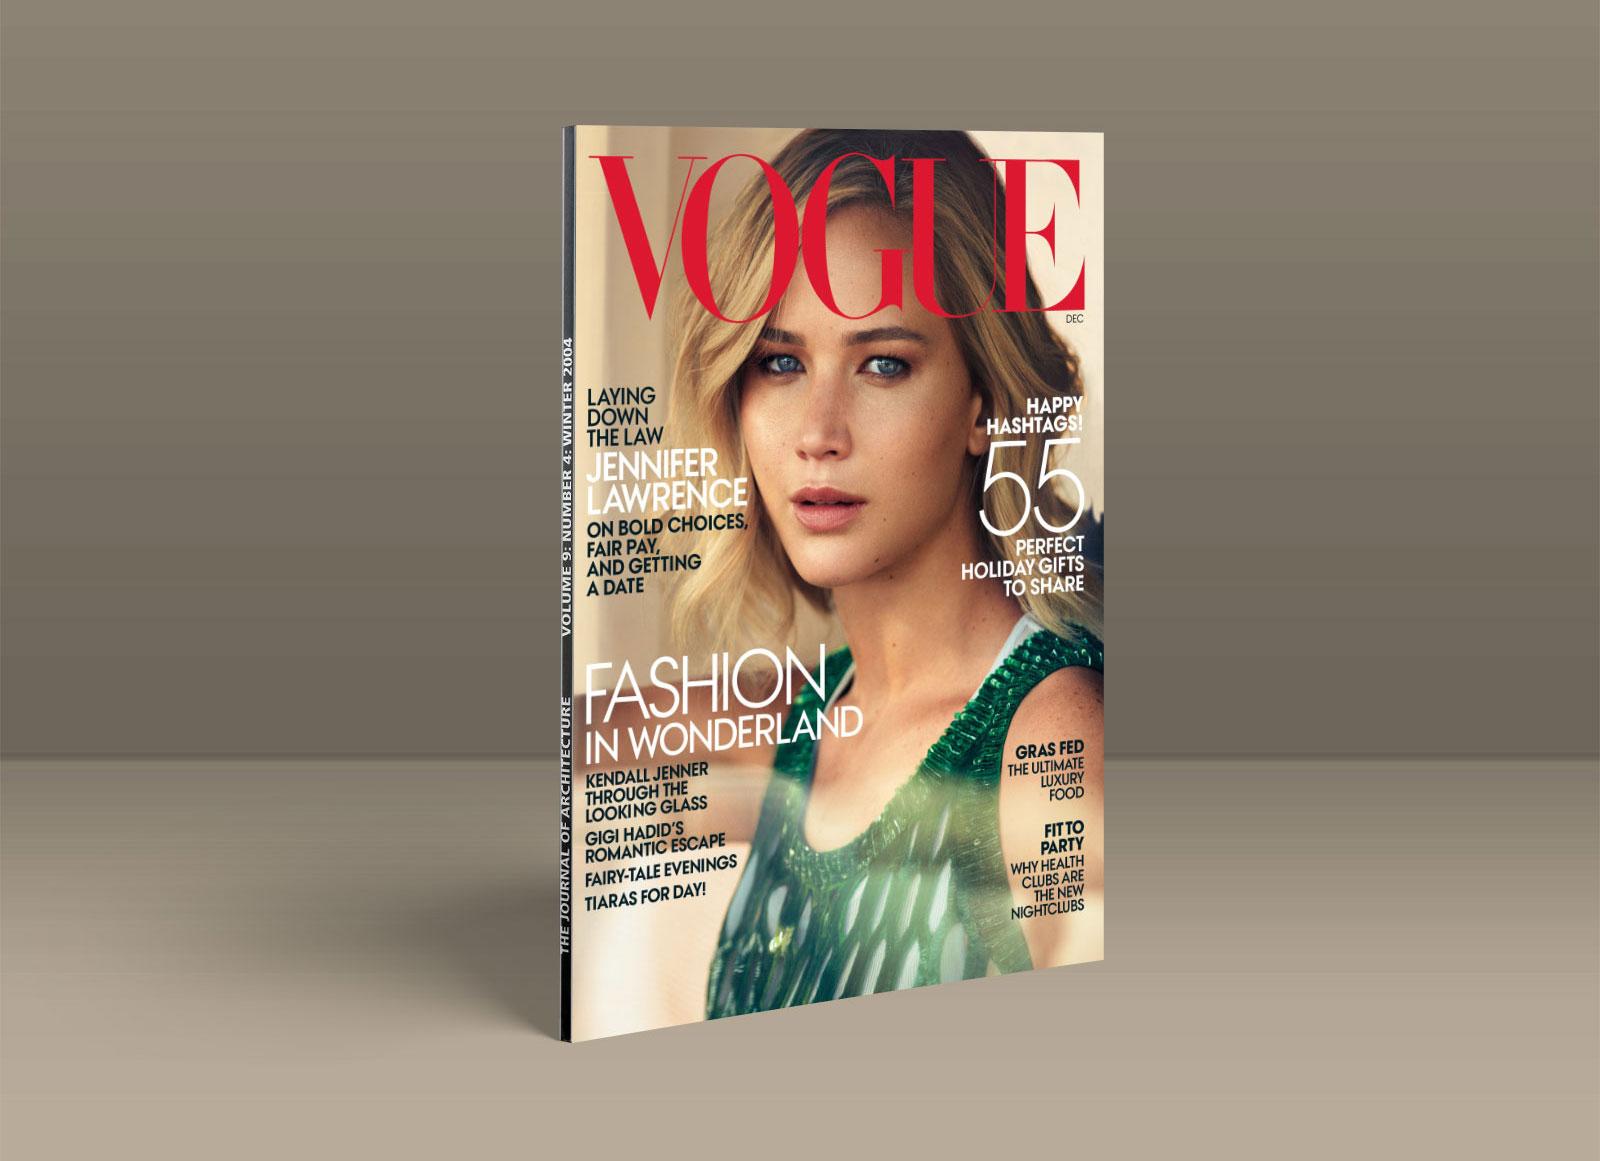 Free-Magazine-Title-Mockup-PSD